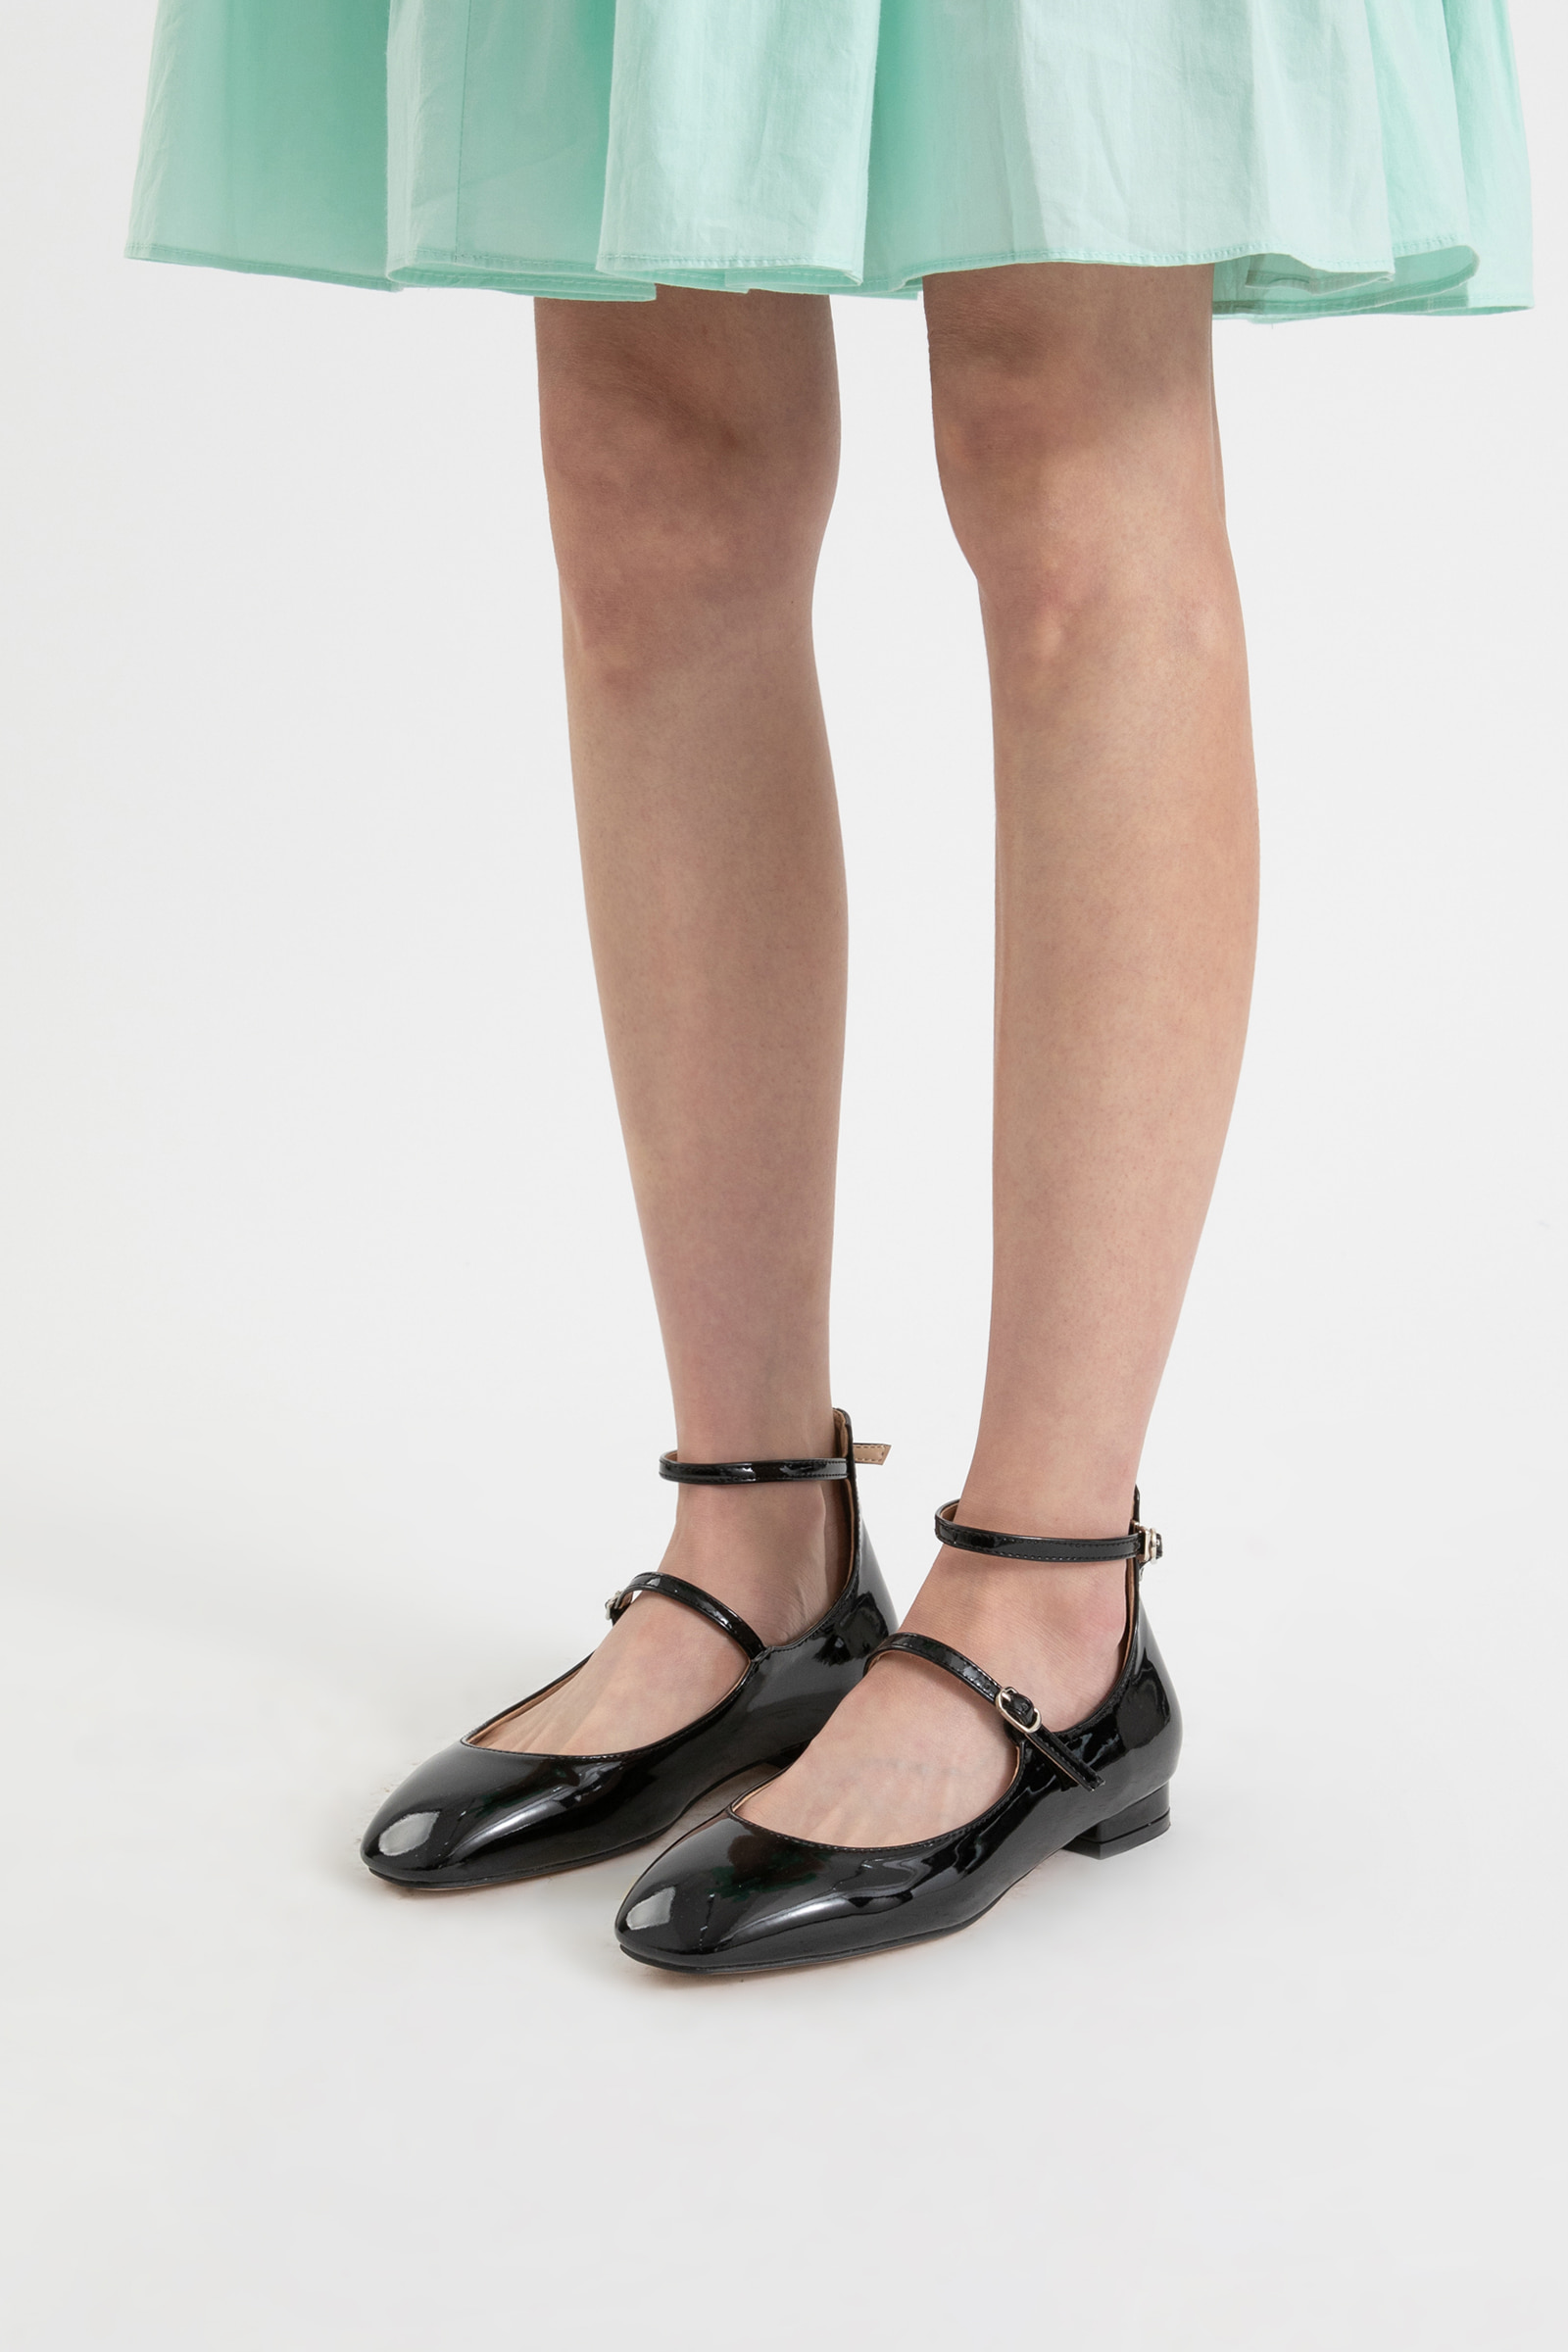 Enamel Mary Jane flat sandals